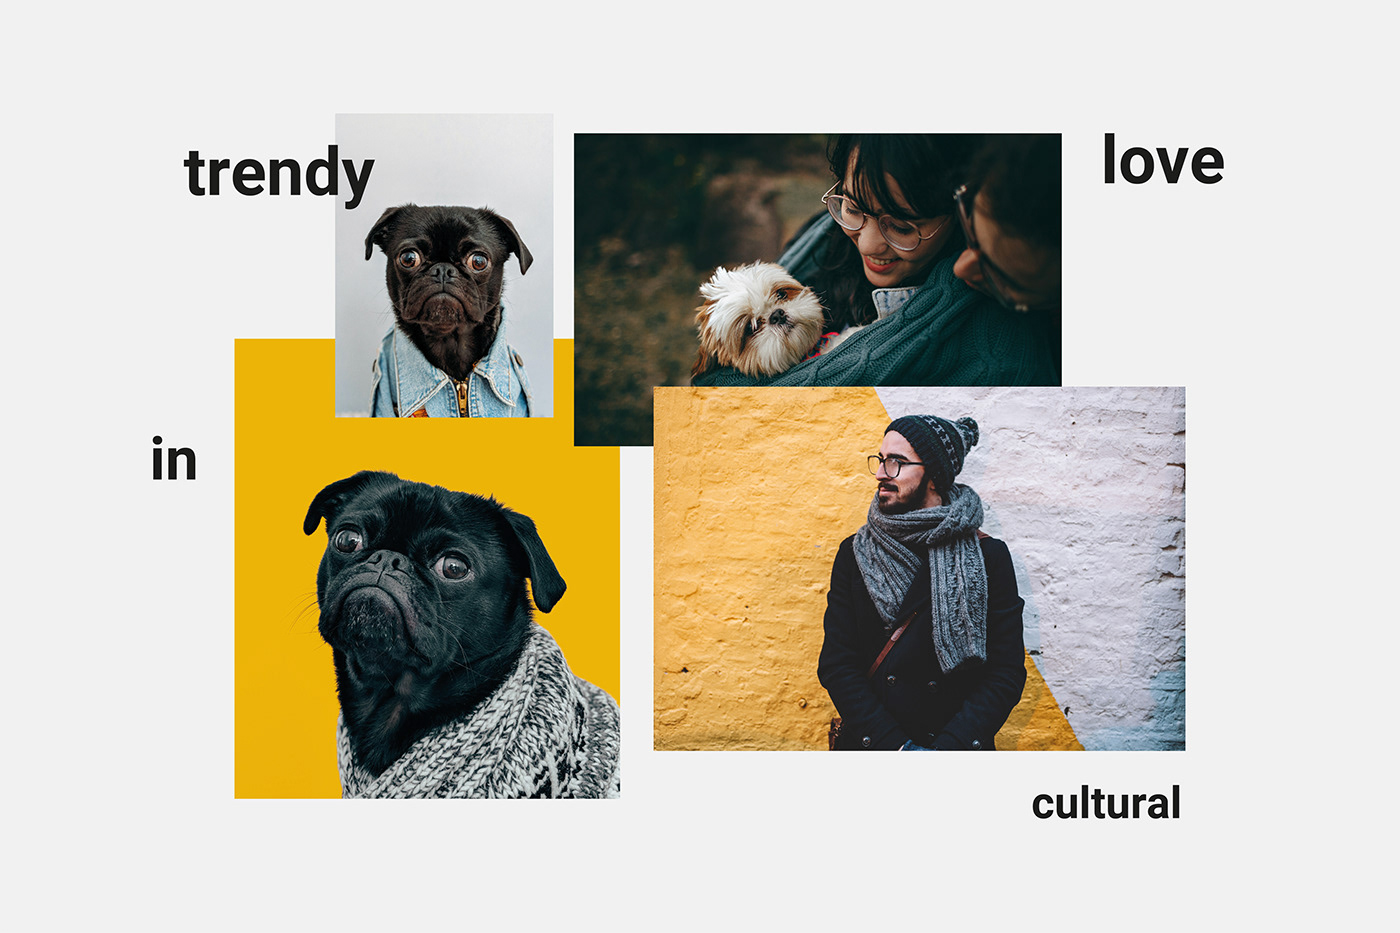 Image may contain: dog, carnivore and animal